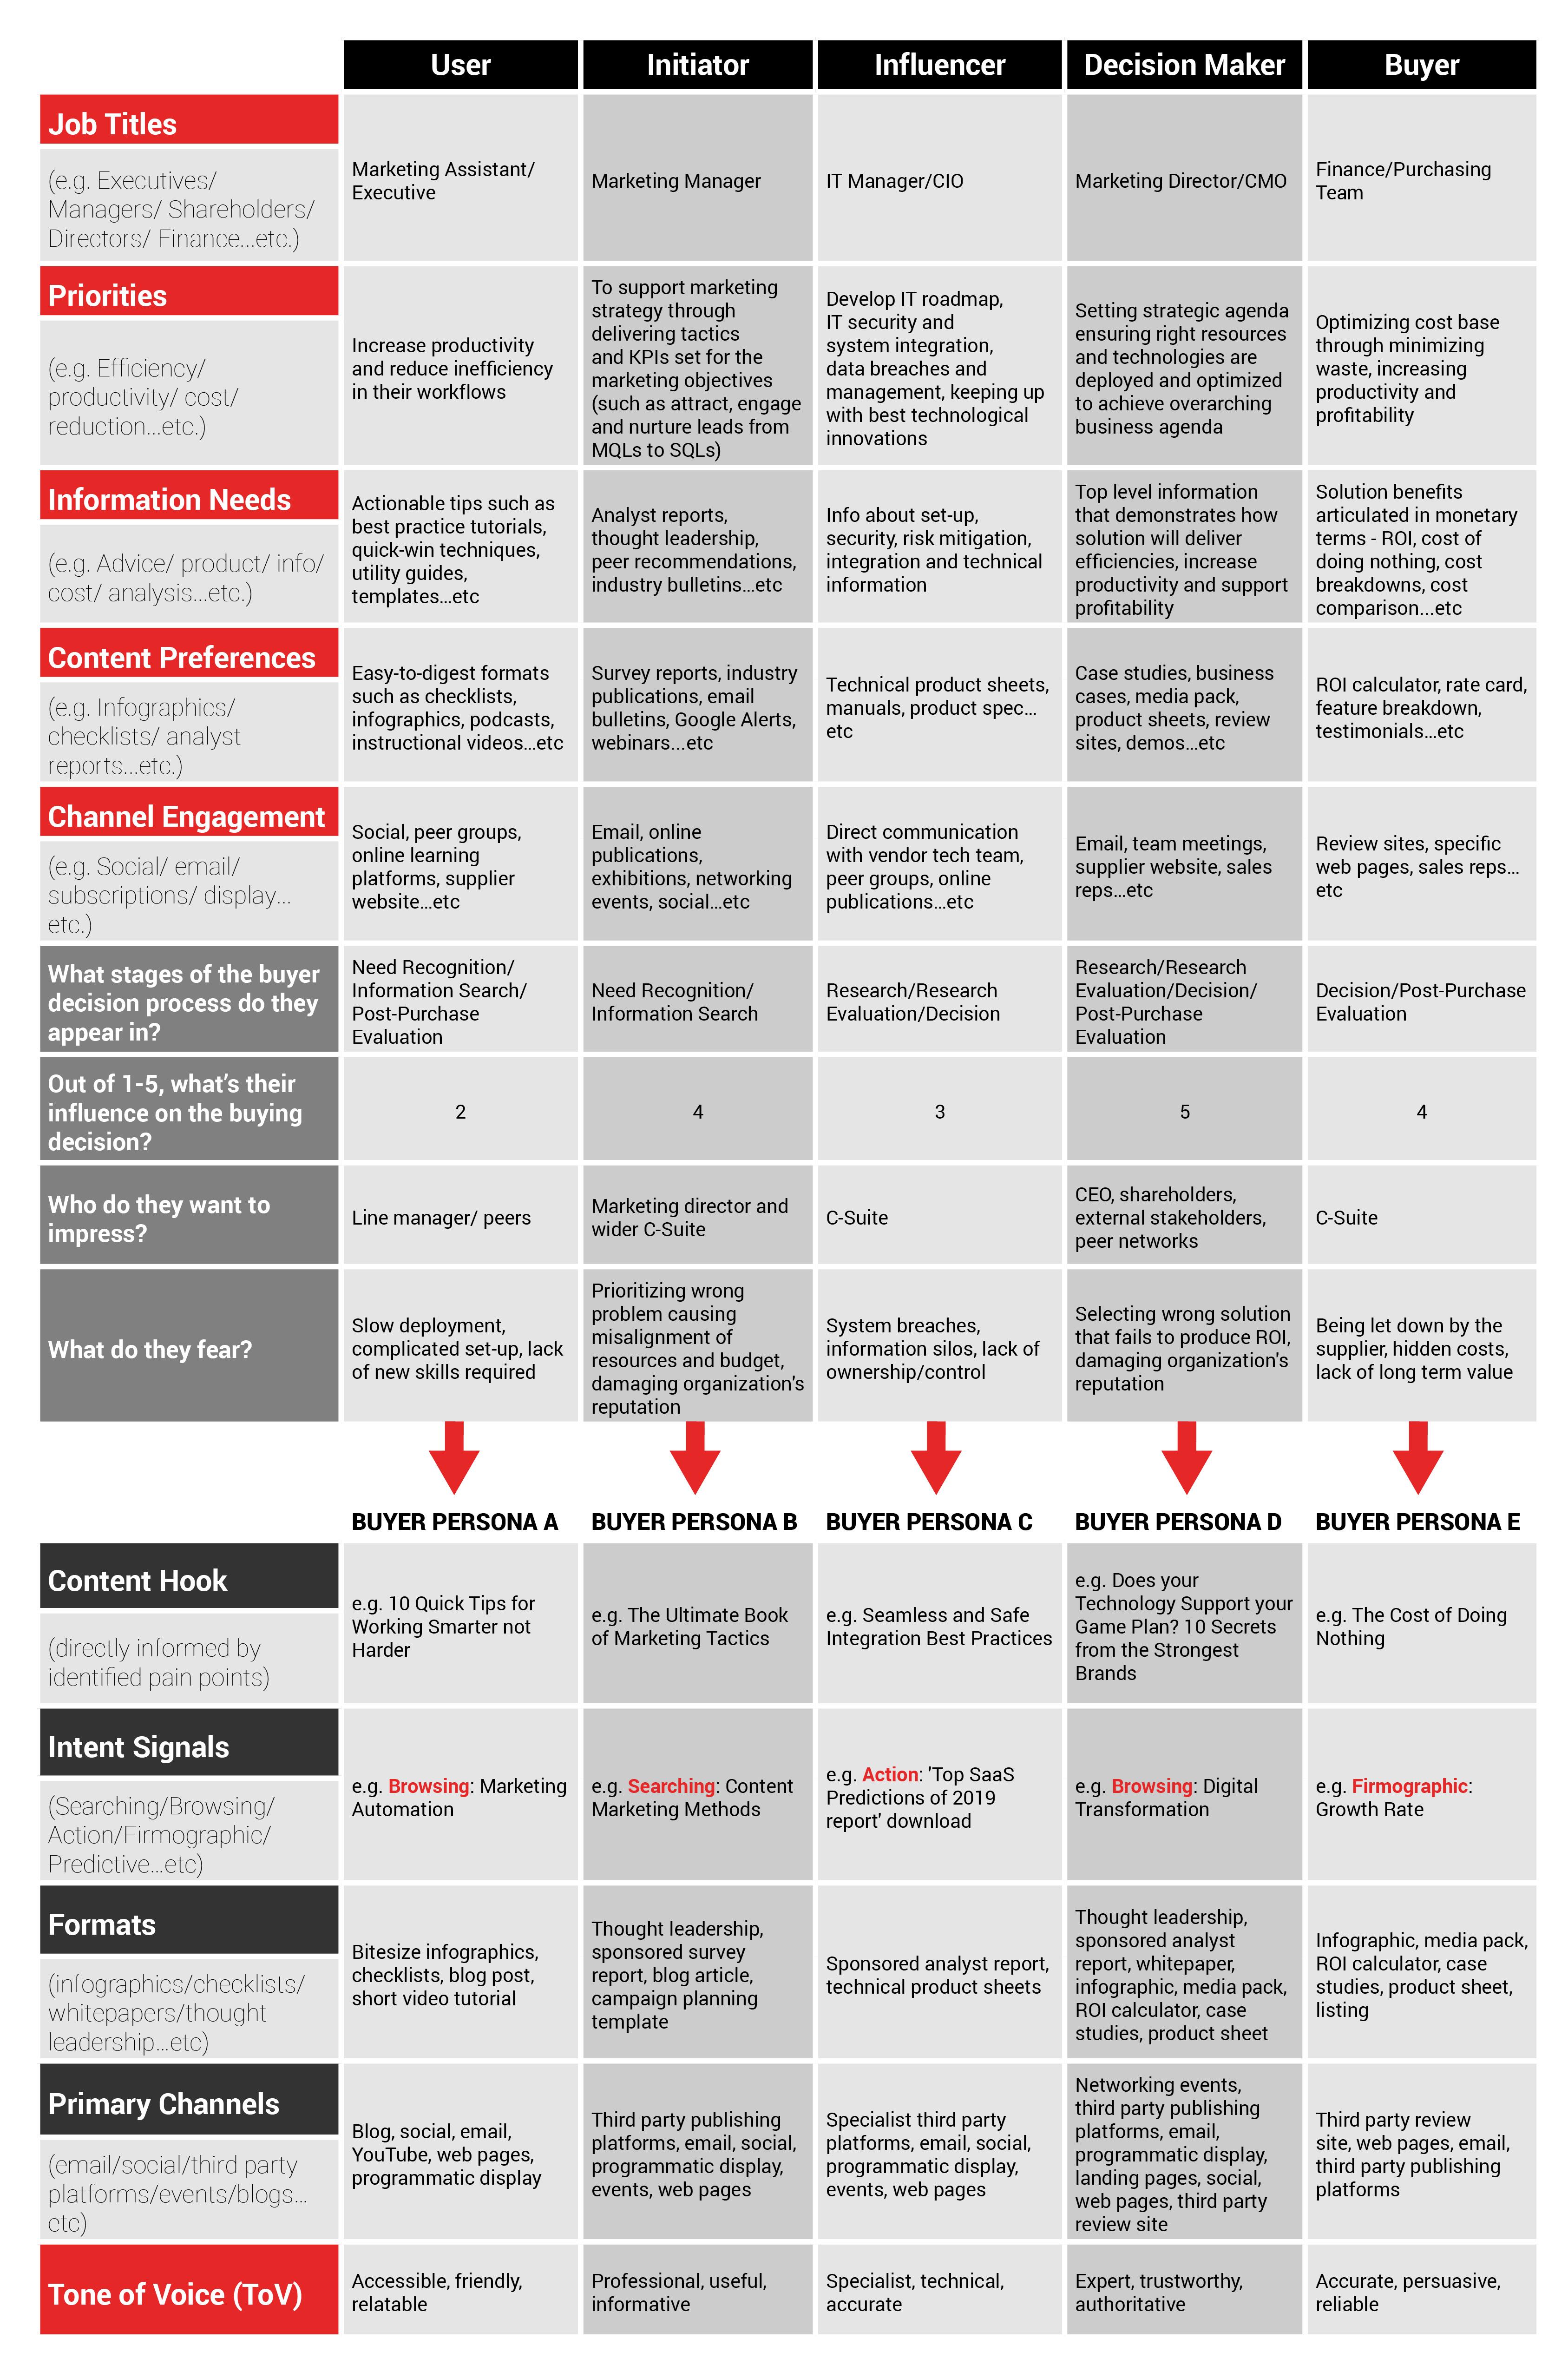 B2B DMU Buyer Persona Cheat Sheet - Inbox Insight